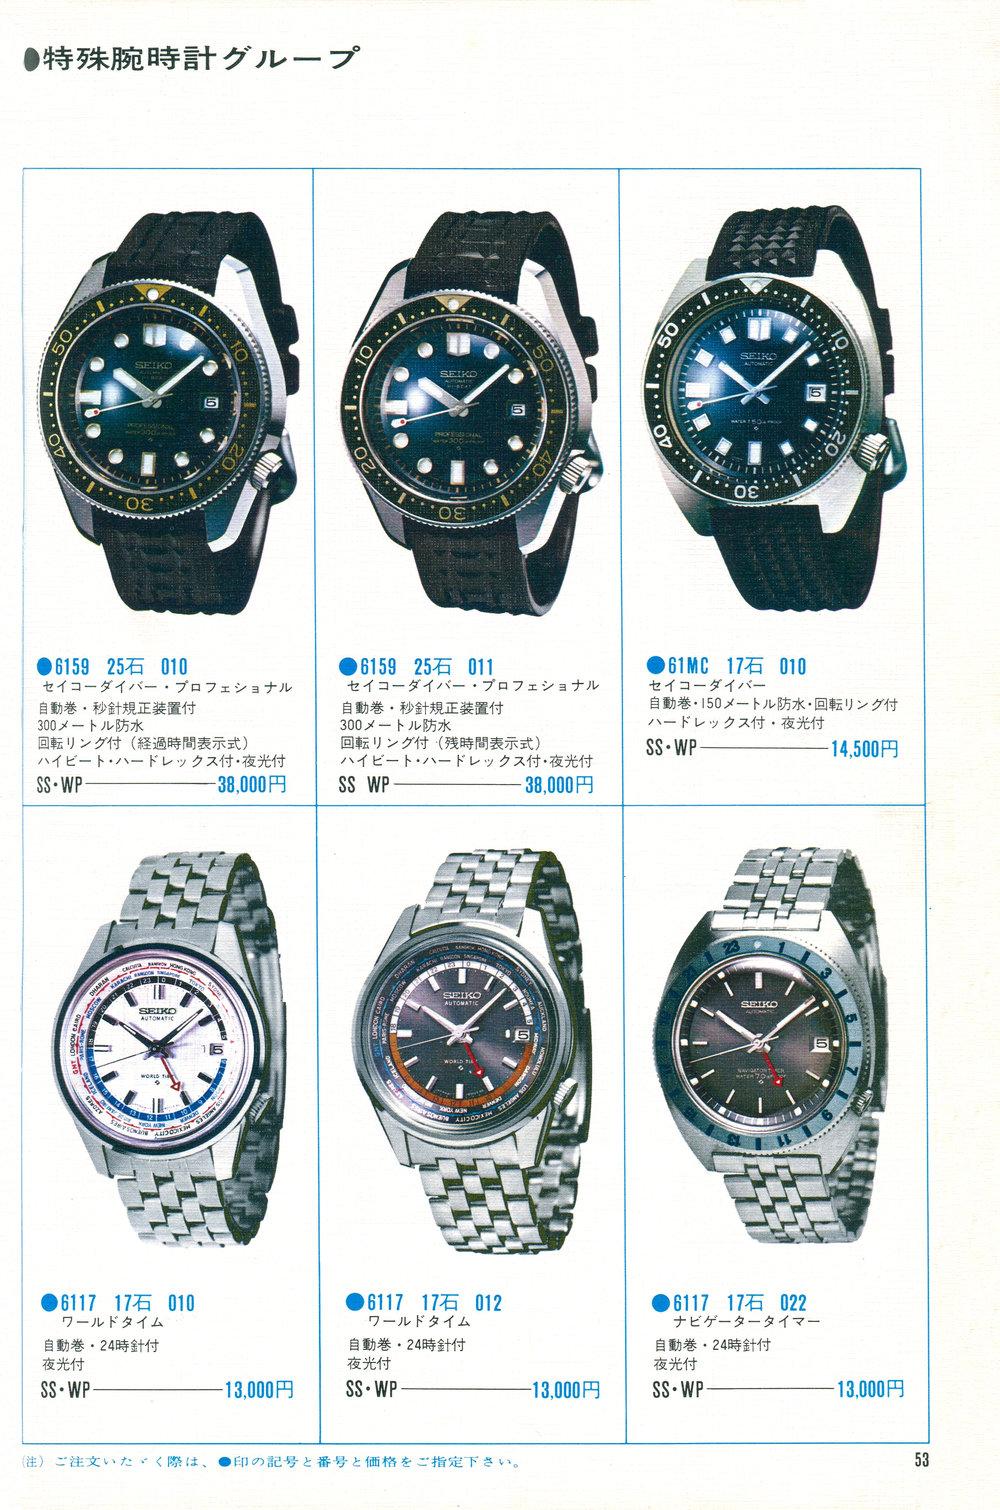 1970 Vol.1 Seiko JDM Catalog